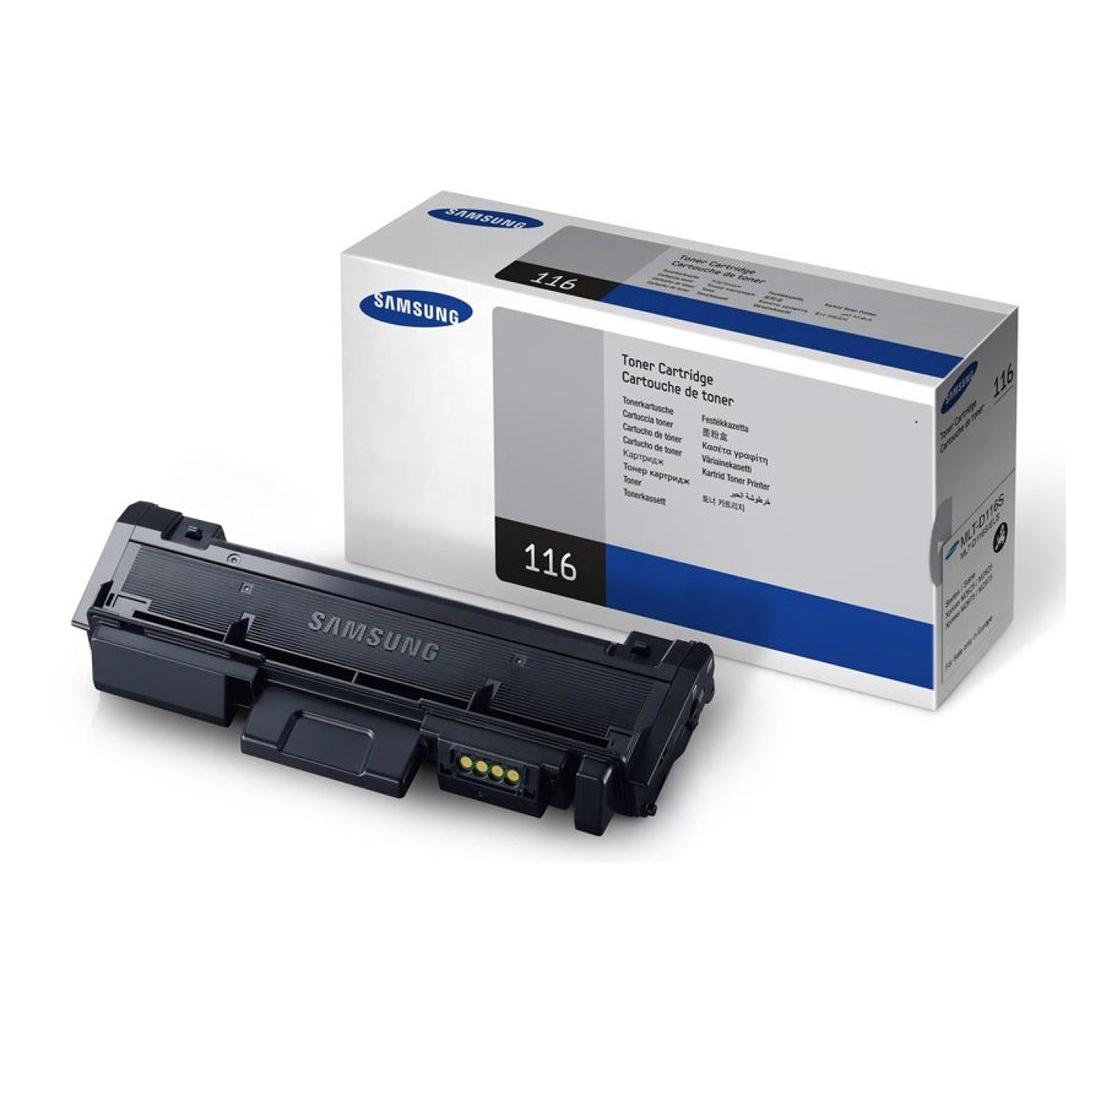 Samsung Laser Toner Cartridge Page Life 1200pp Black Ref SU840A